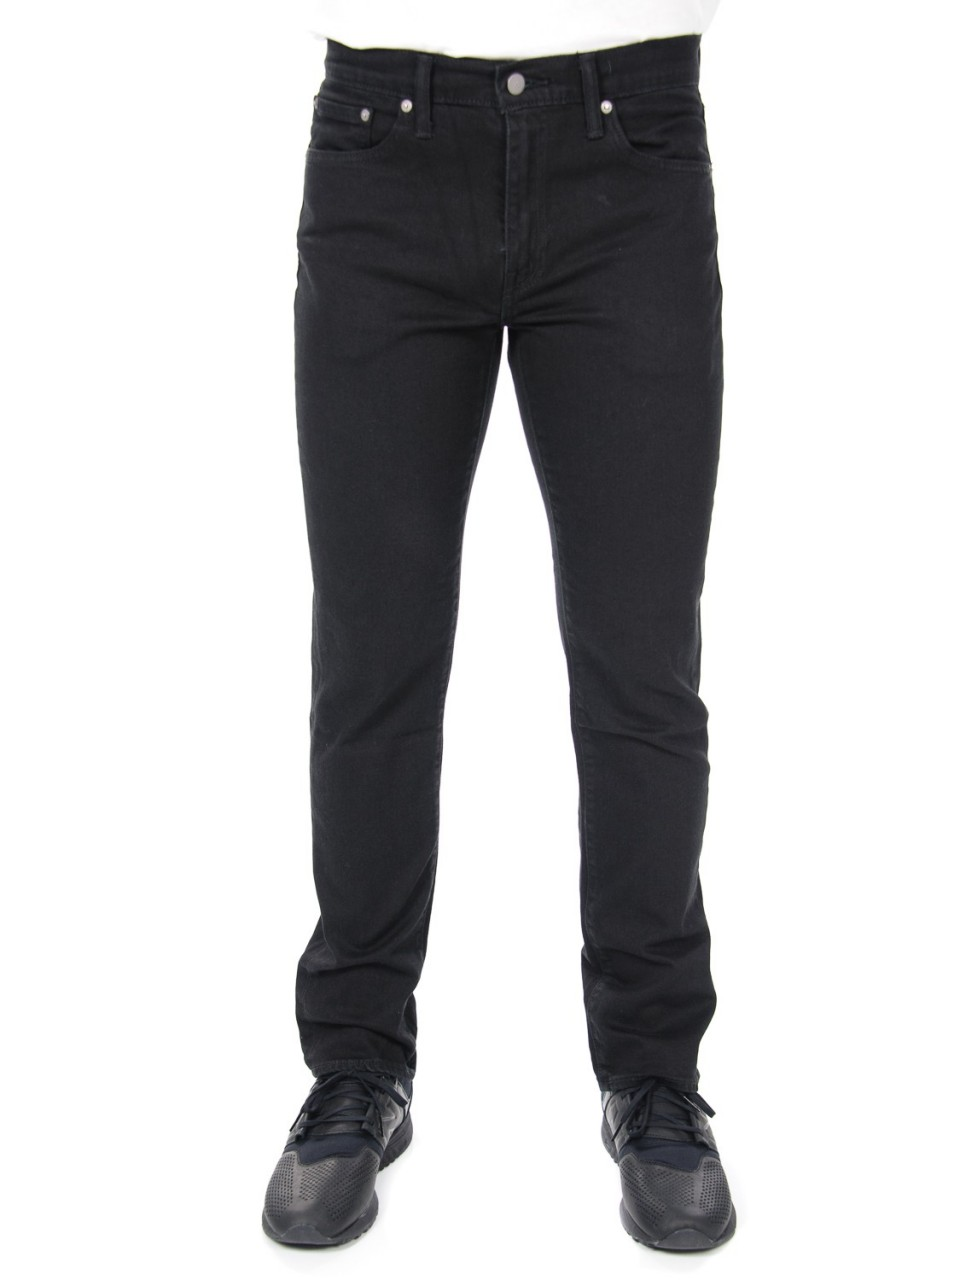 Levi's Uomo Jeans Levi's 511 Uomo Night Shine L 34 5111507G